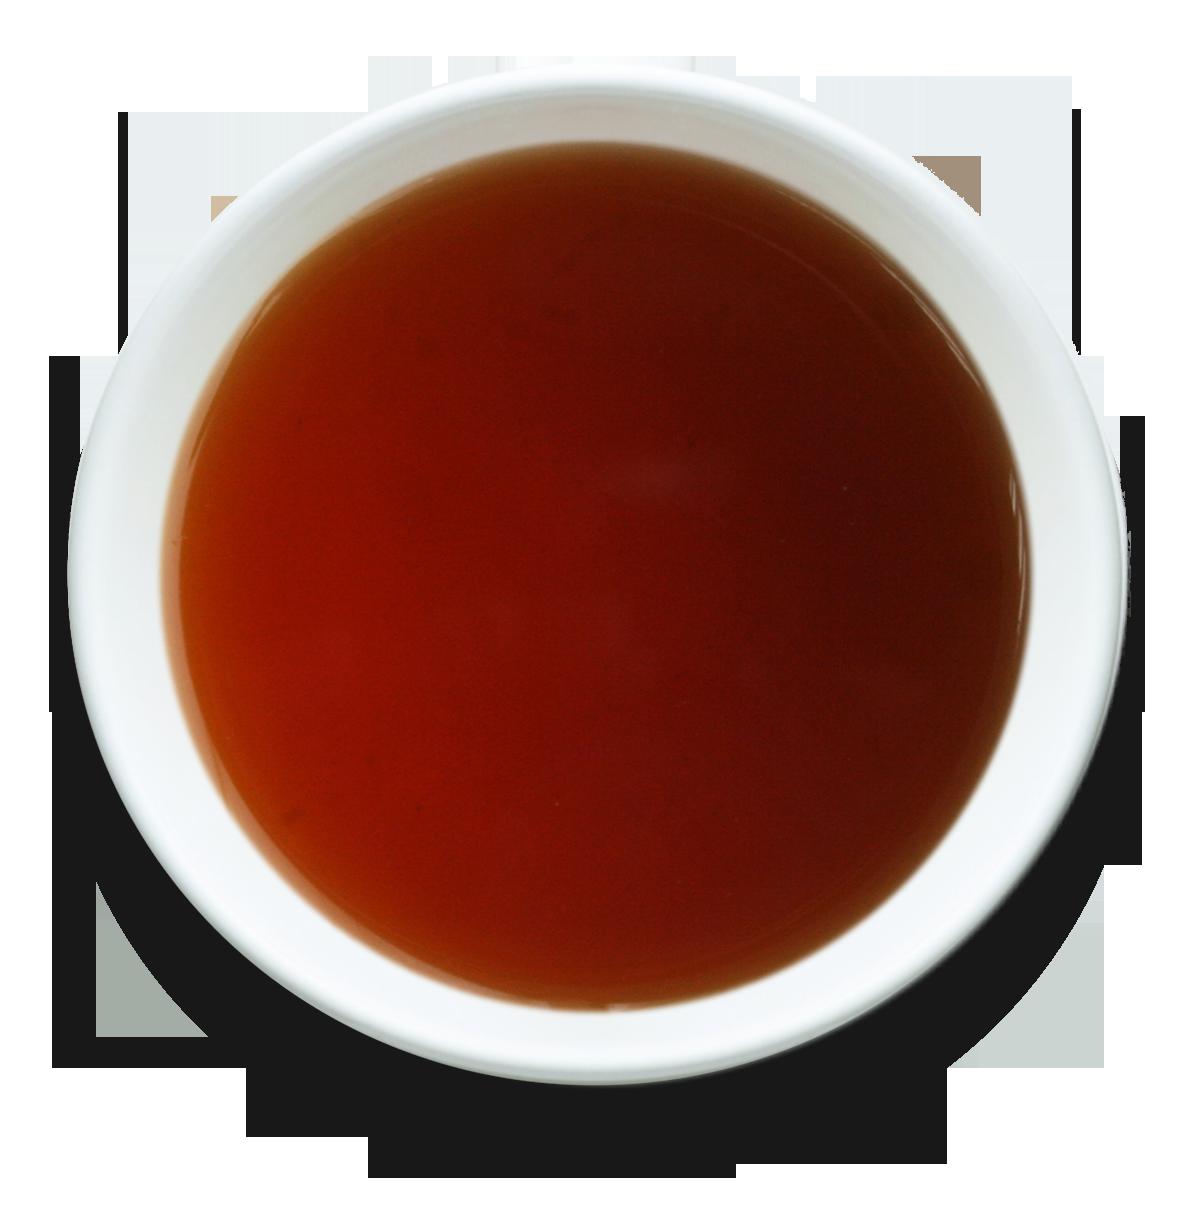 black tea qualitea ceylon pvt ltd. Black Bedroom Furniture Sets. Home Design Ideas